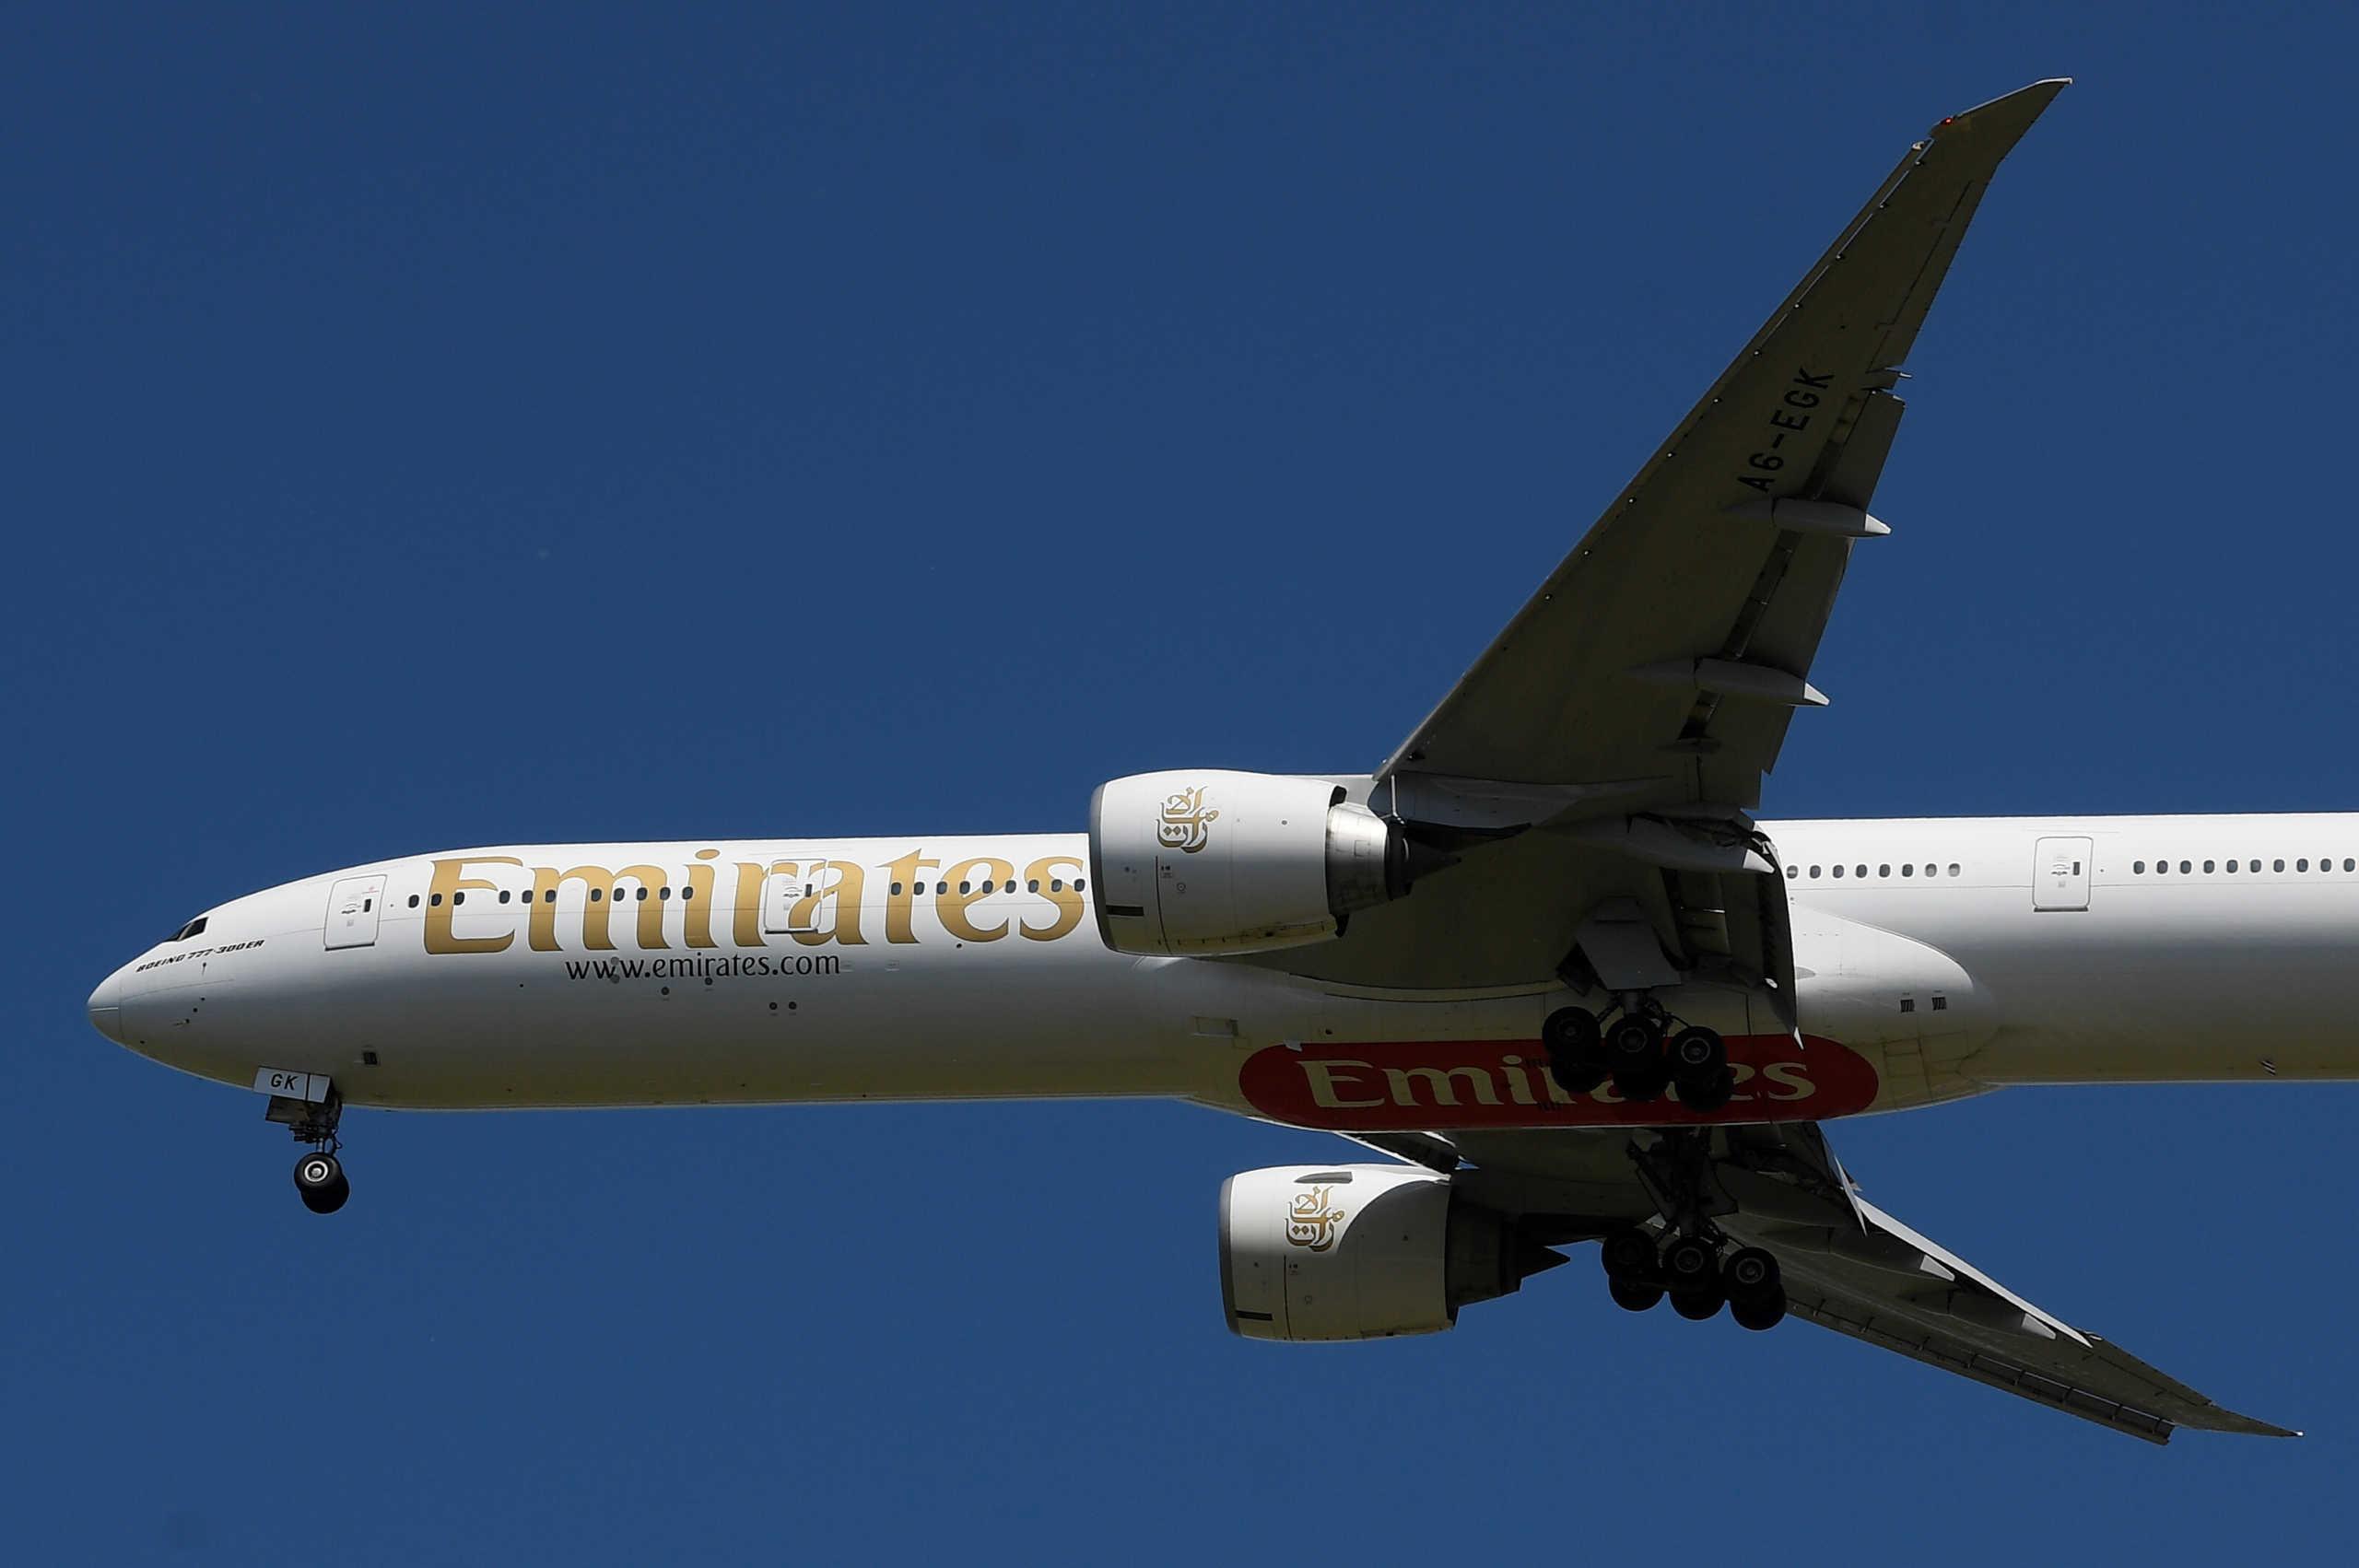 Emirates: Ξεκινάει πτήσεις, ποια είναι τα μέτρα ασφαλείας κατά του κορονοϊού